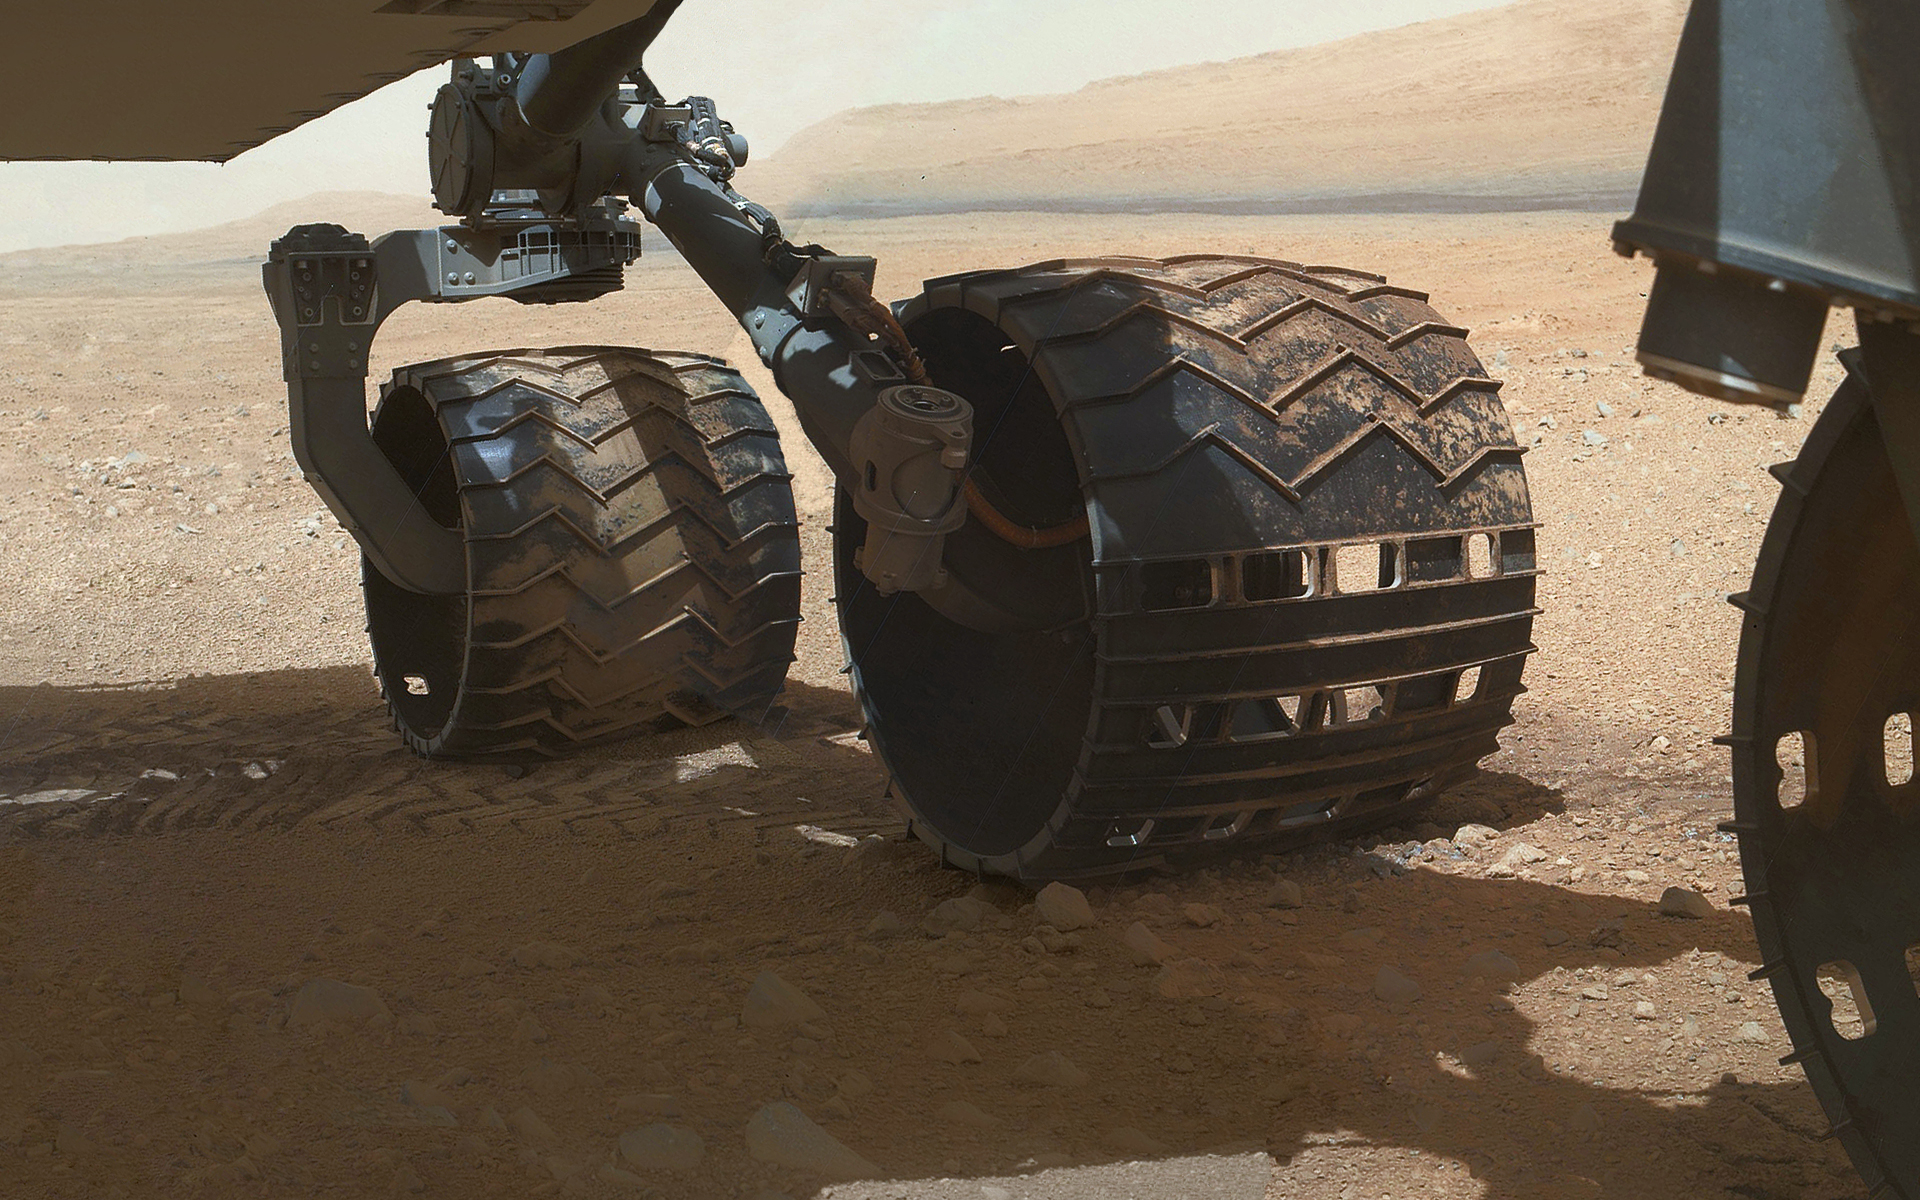 mars rover s10 plus wallpaper - photo #41